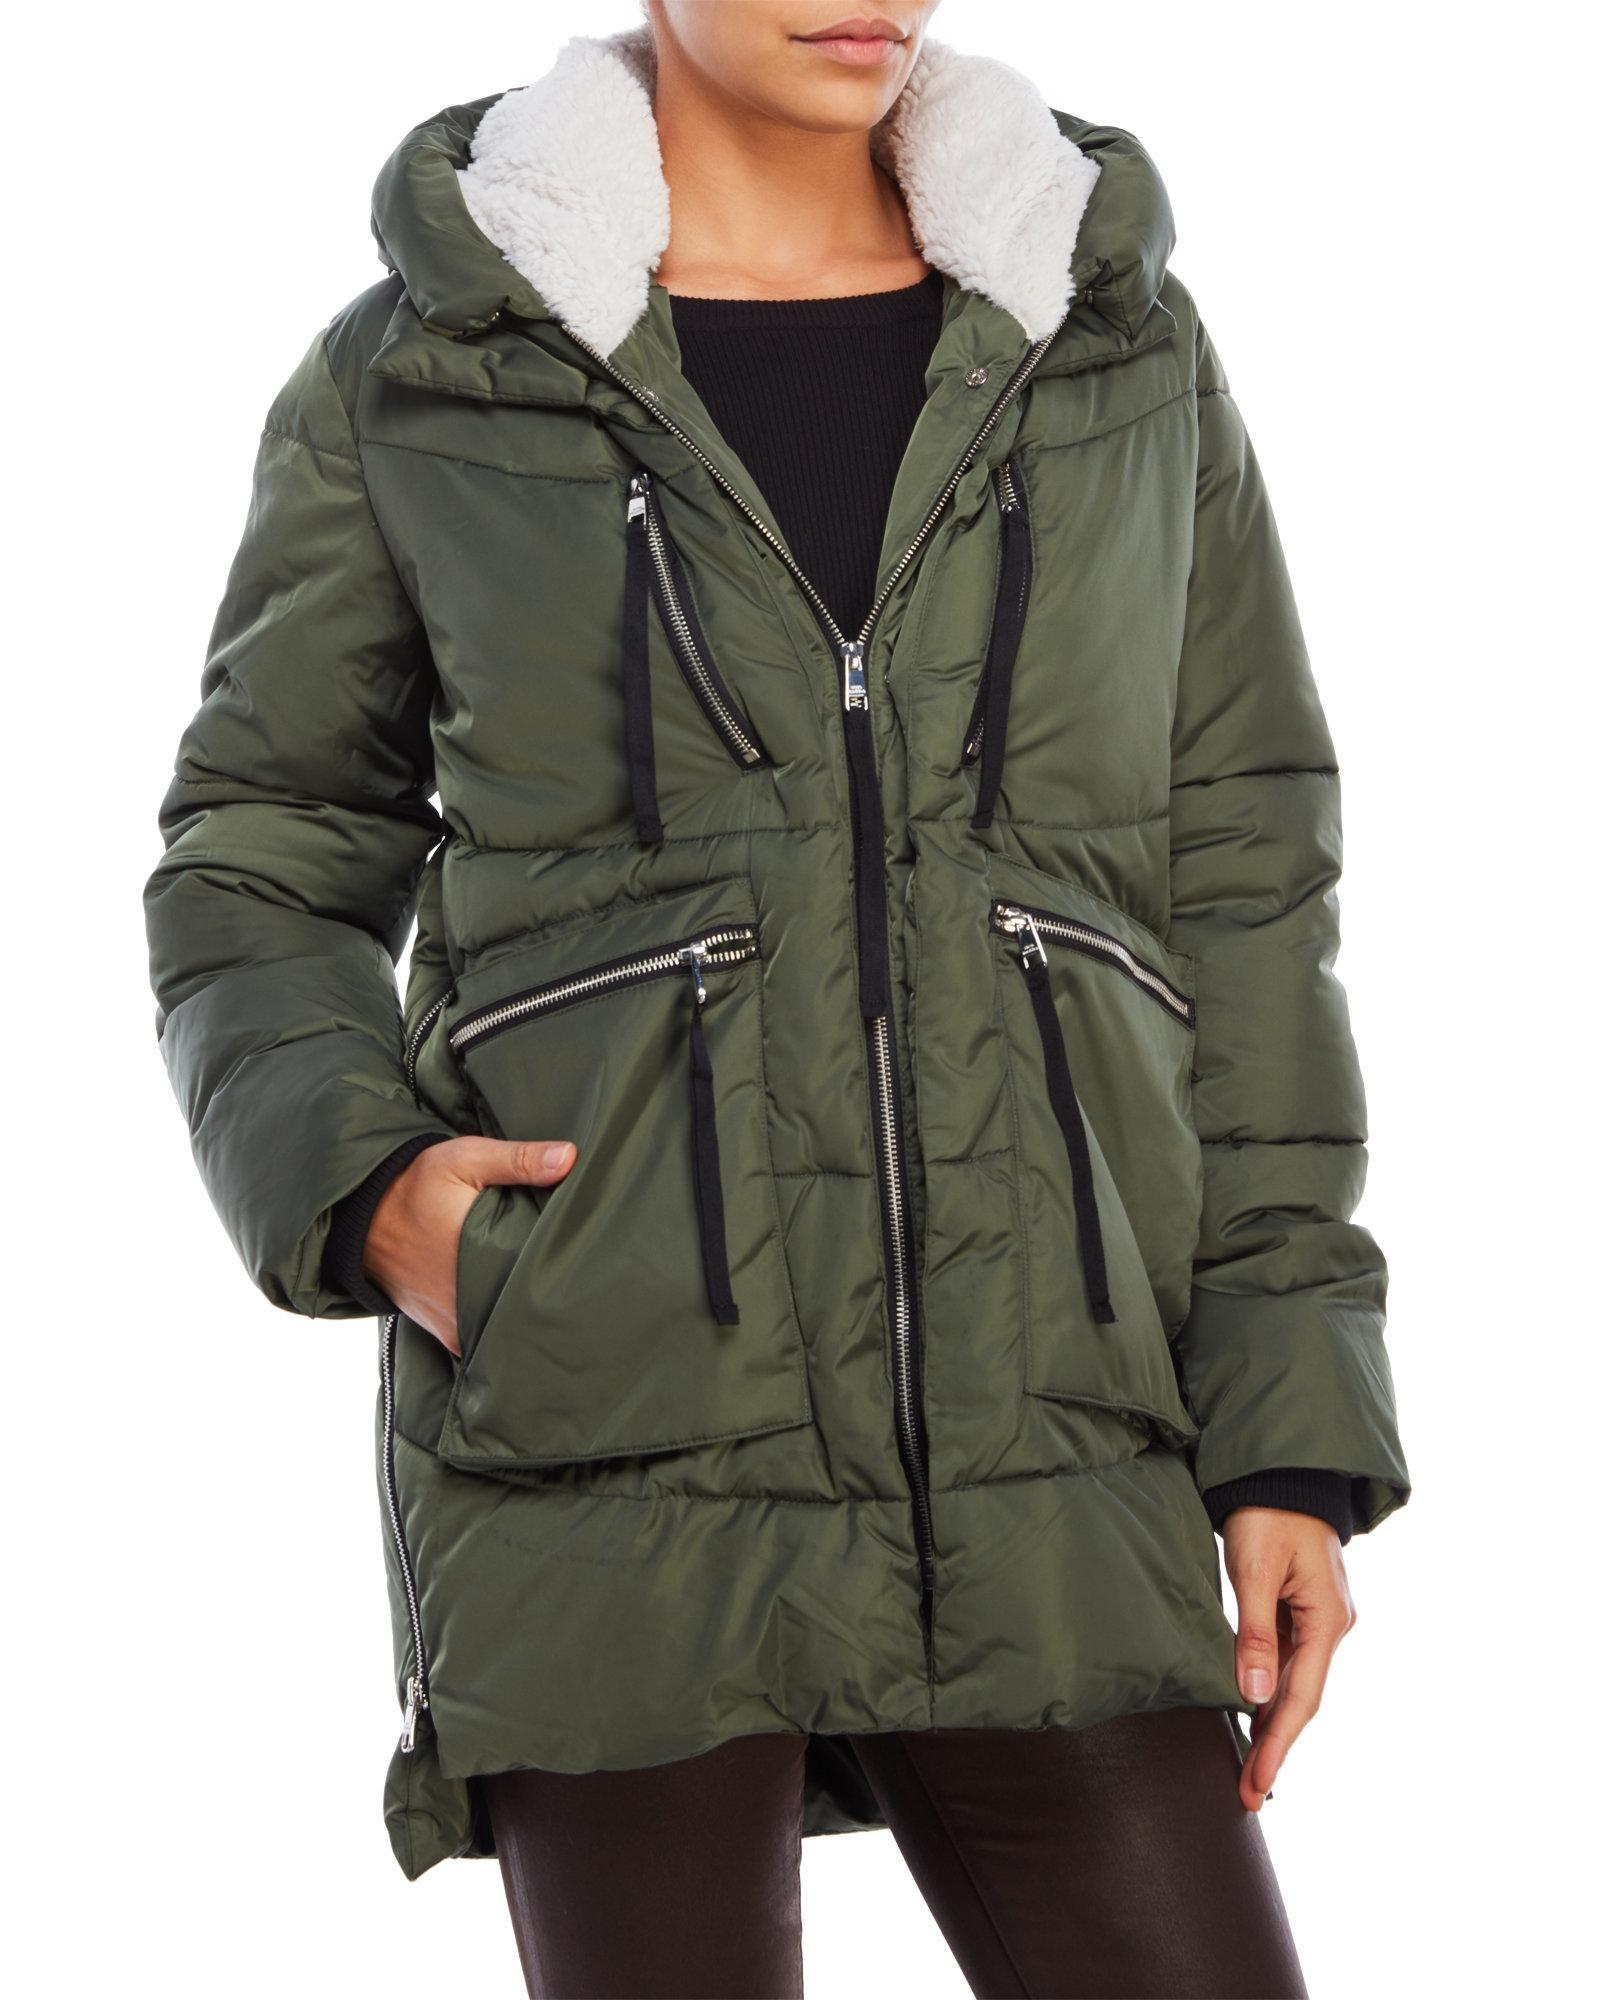 Steve Madden Faux Fur Trim Hooded Puffer Jacket In Green